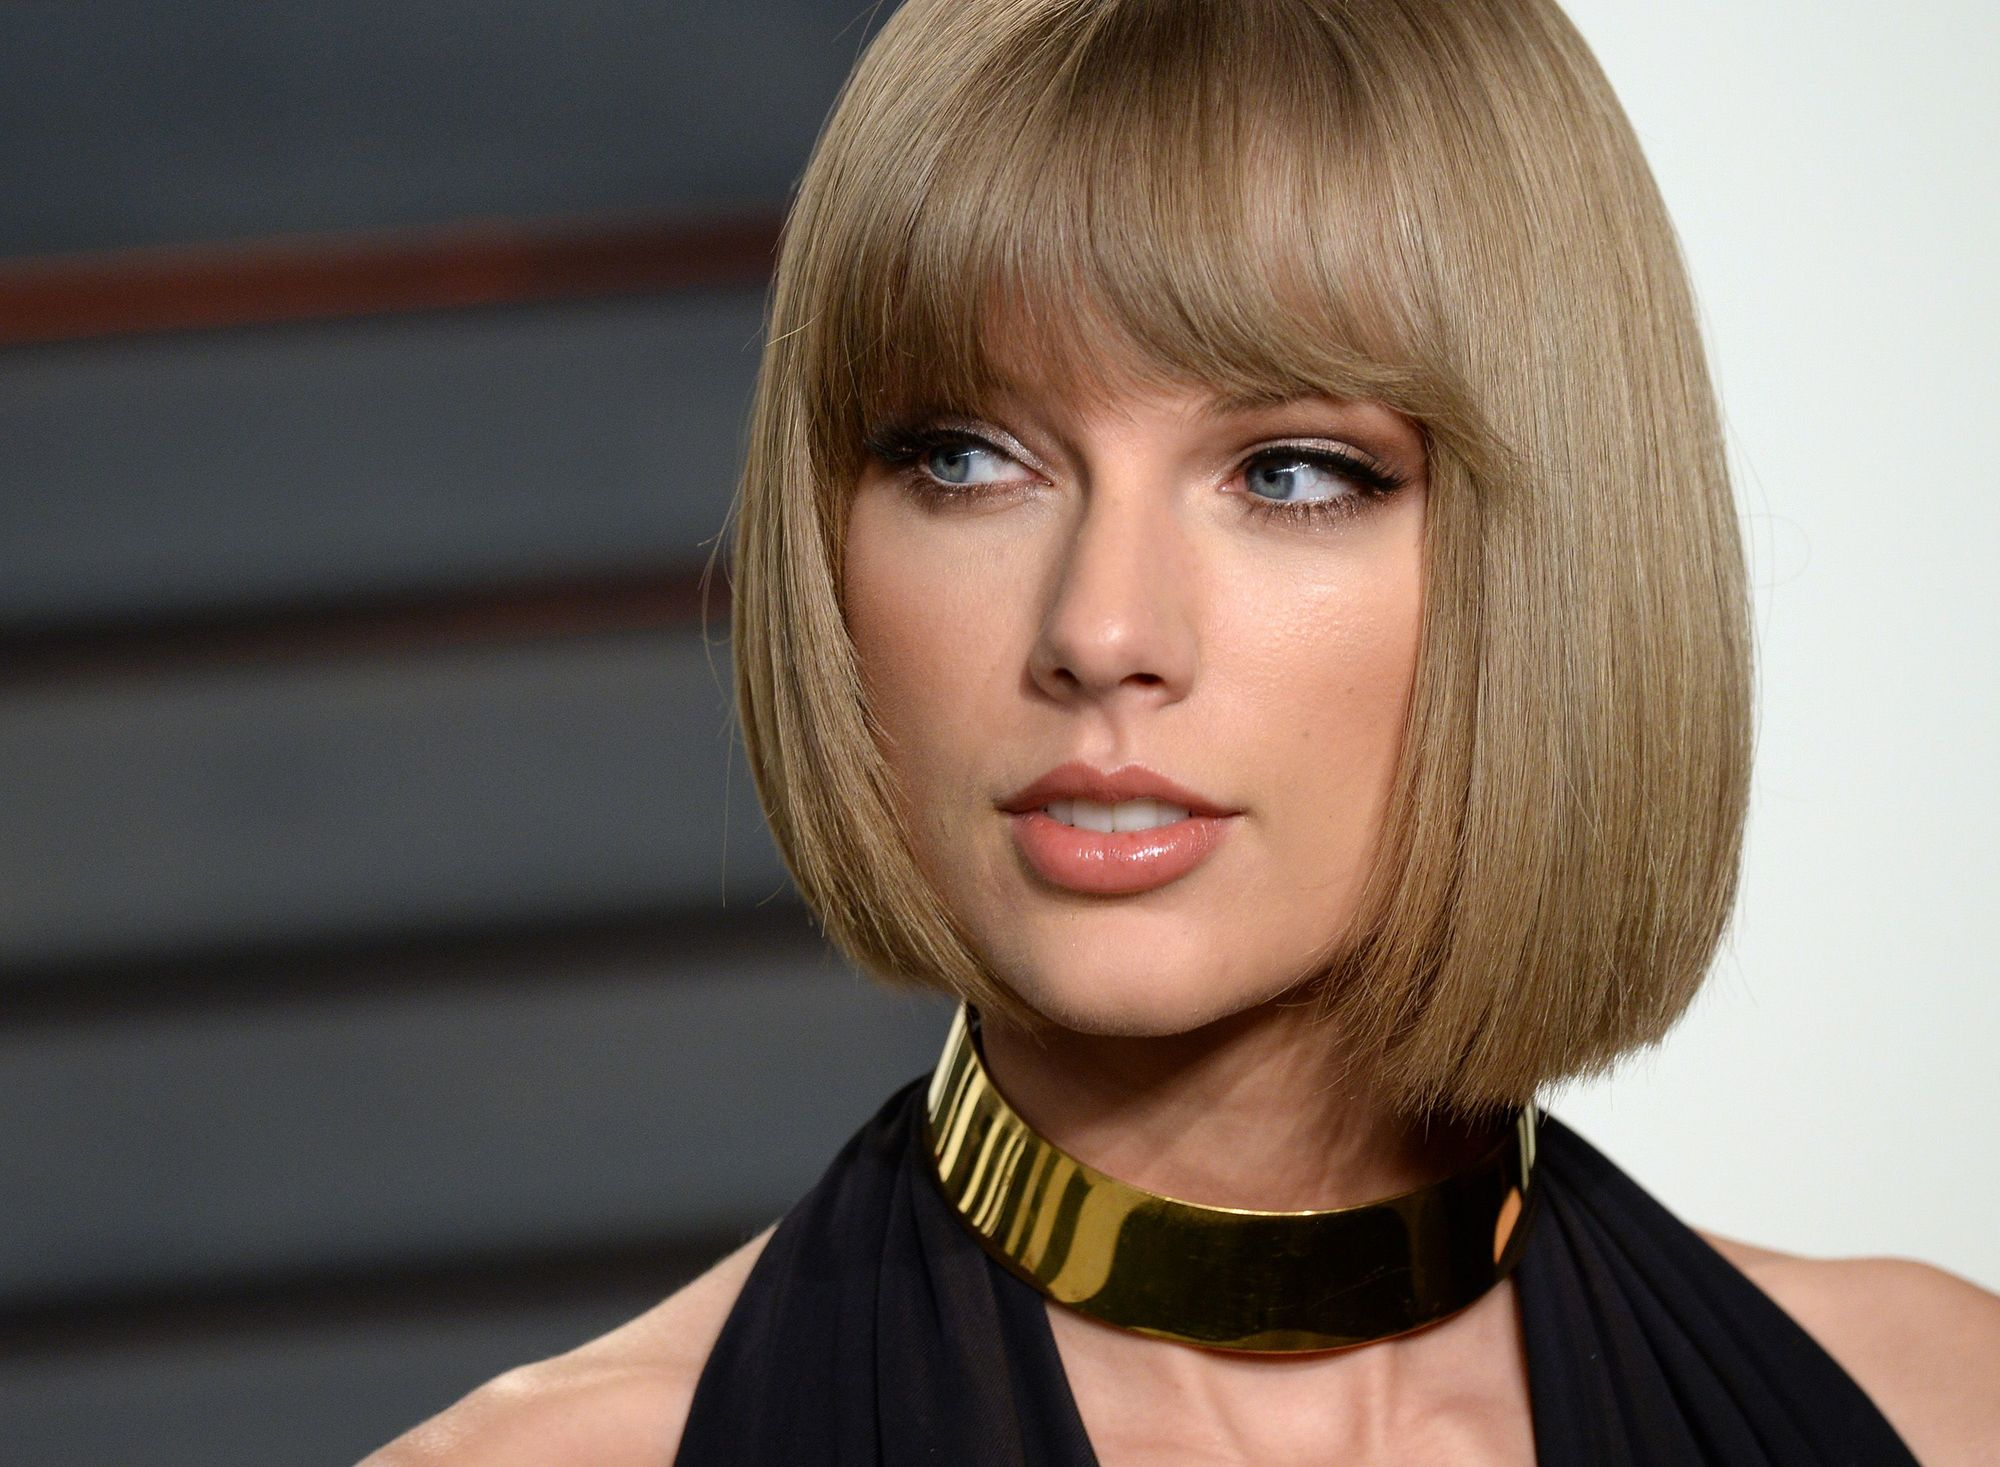 Taylor Swift con cabello rubio ceniza, super planchado. Corte carre peinado hacia adentro con flequillo